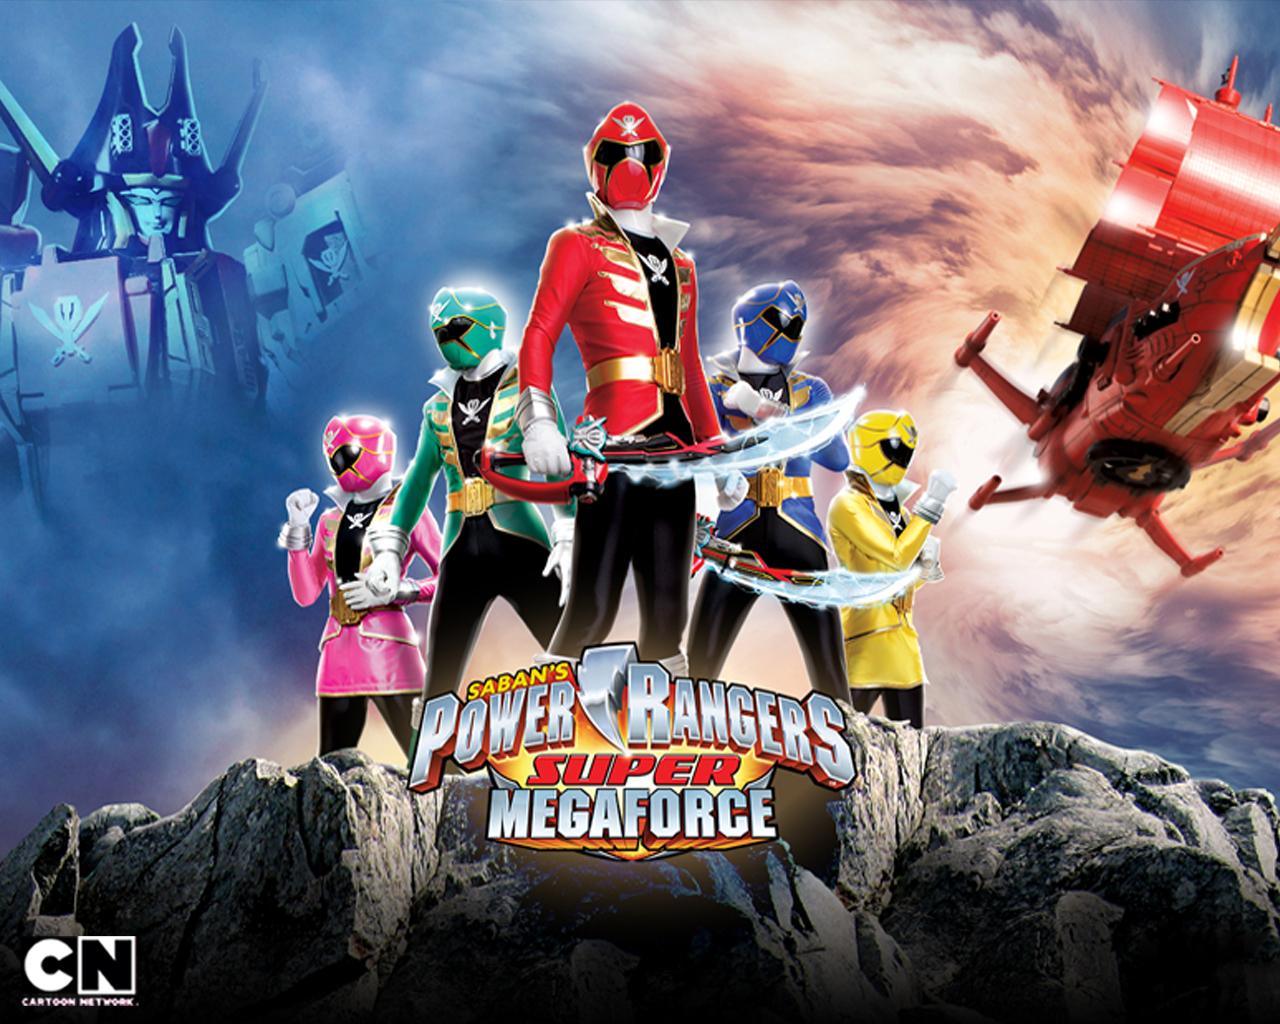 Mega powers wallpaper wallpapersafari - Moto power rangers megaforce ...